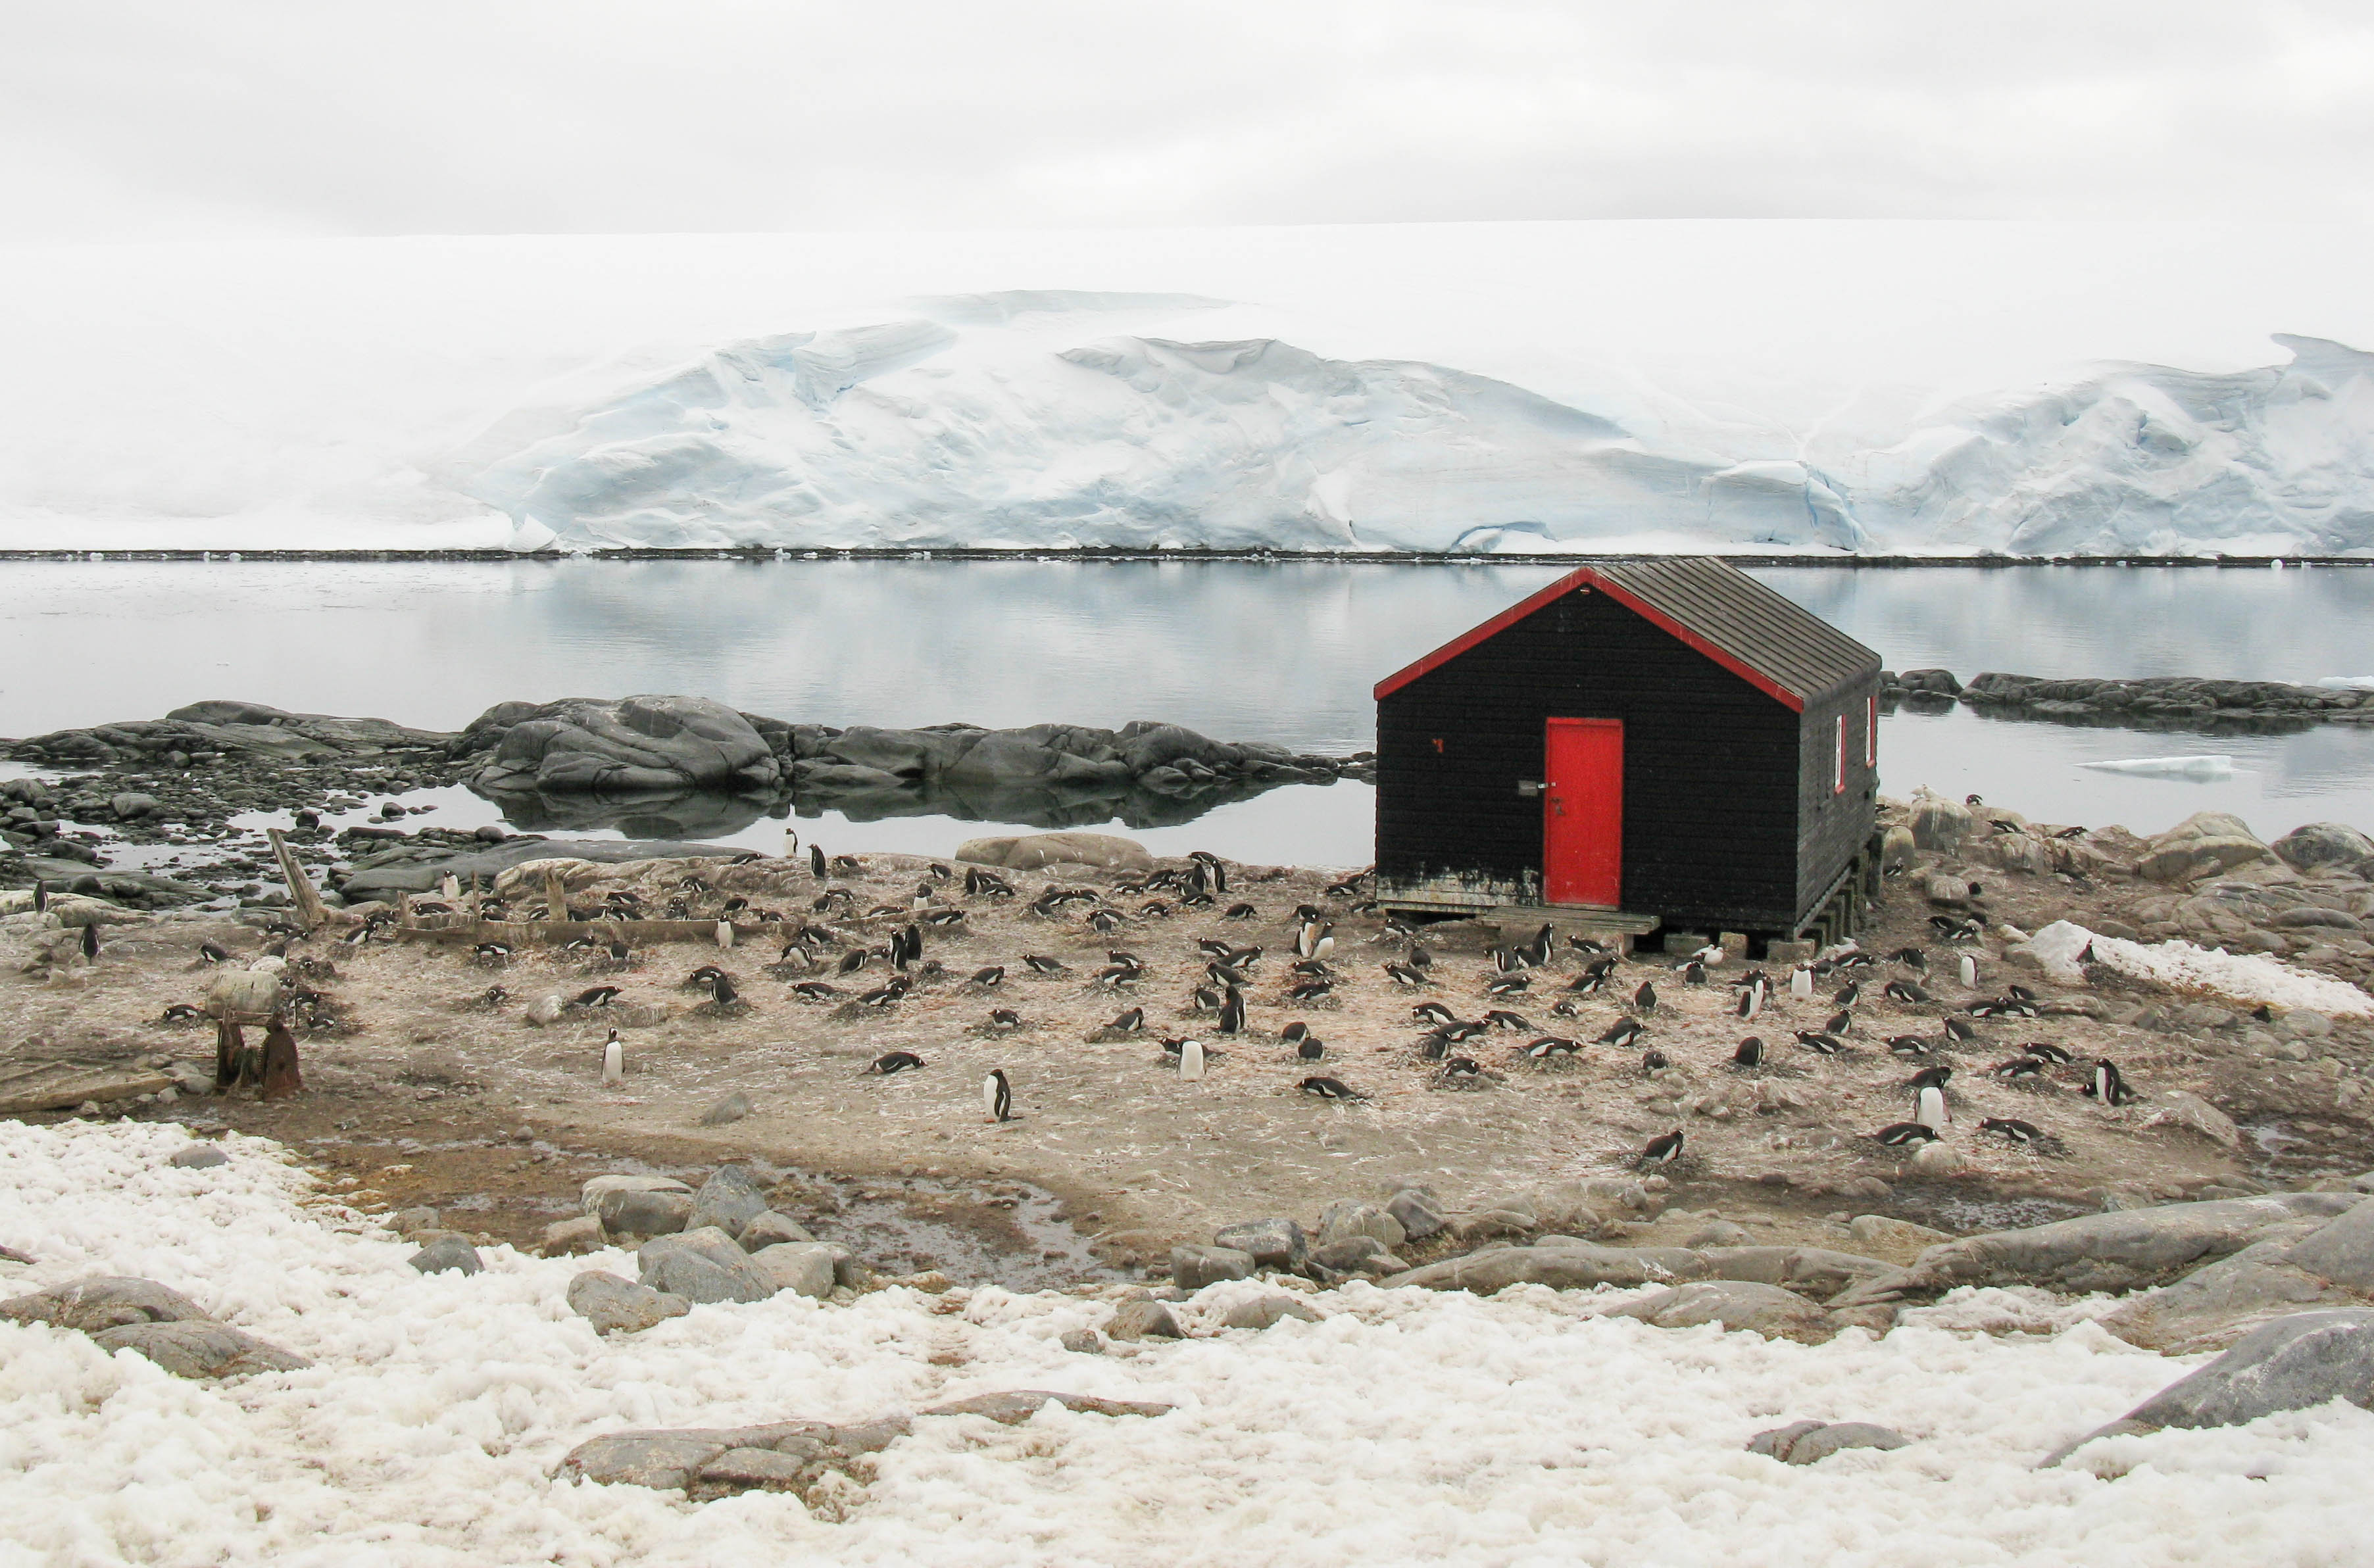 Port Lockroy, Antarctic Peninsula